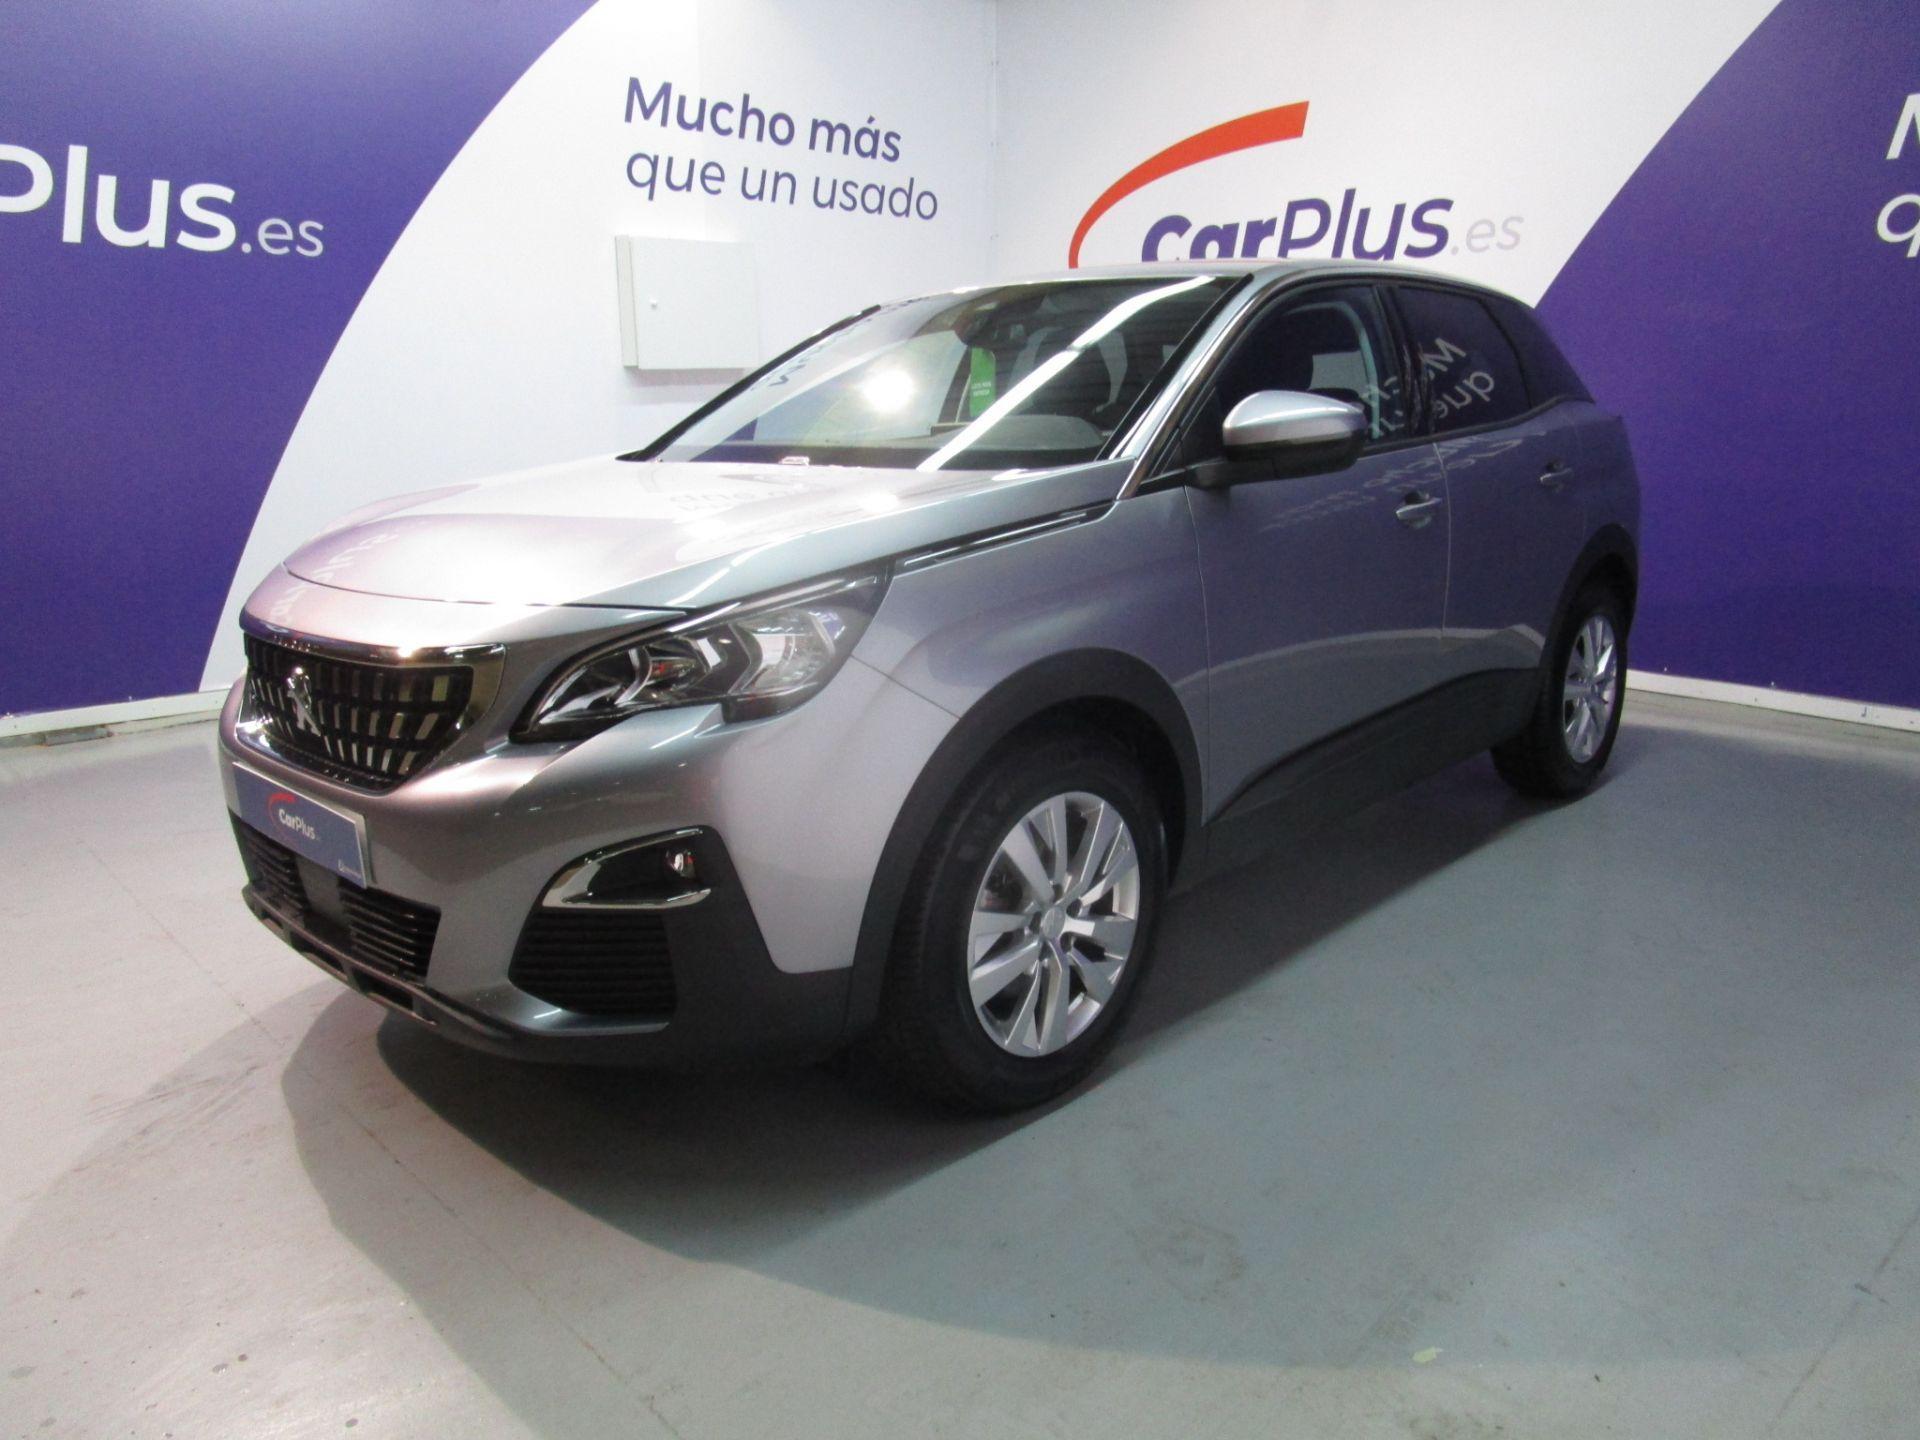 Peugeot 3008 ocasión segunda mano 2020 Diésel por 23.900€ en Madrid